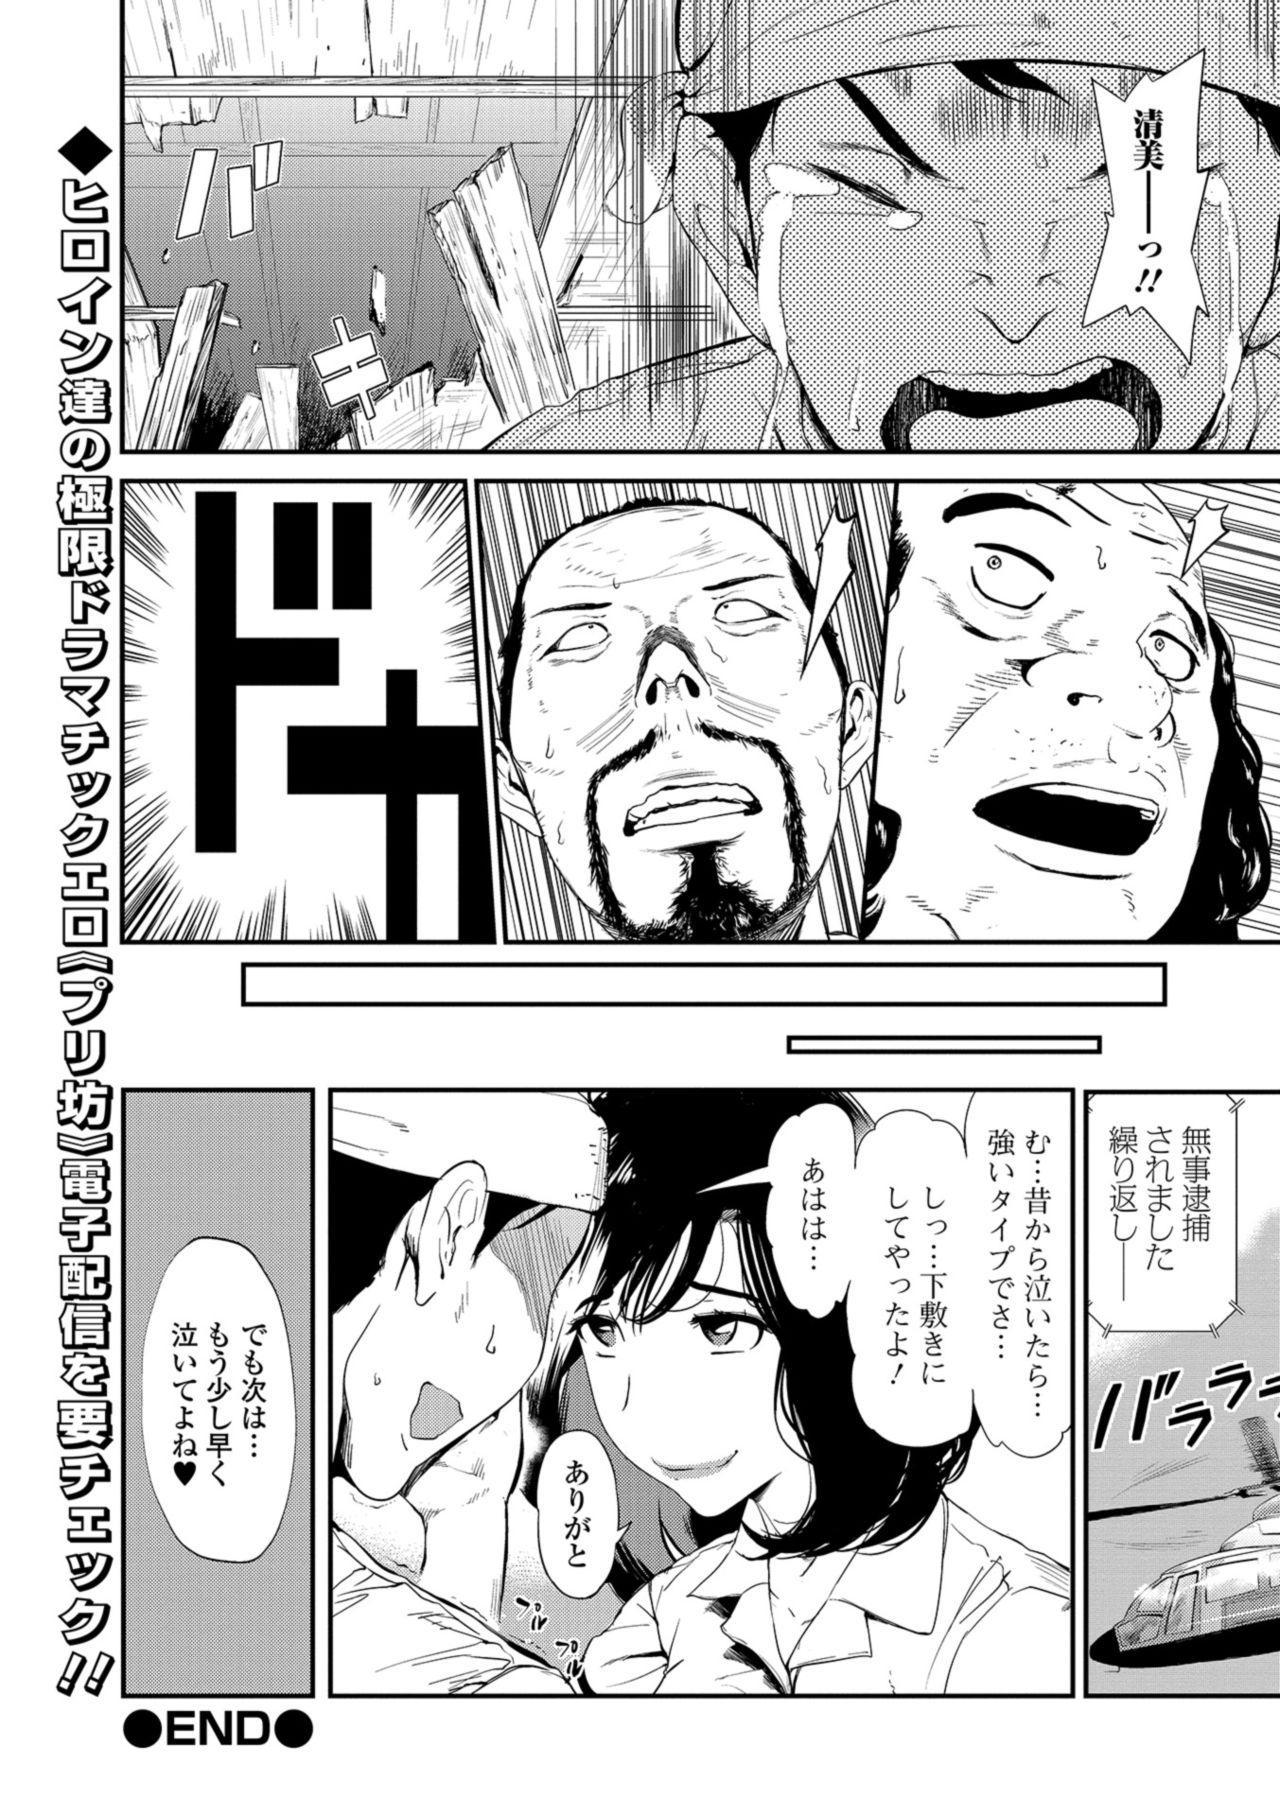 COMIC Shigekiteki SQUIRT!! Vol. 09 179